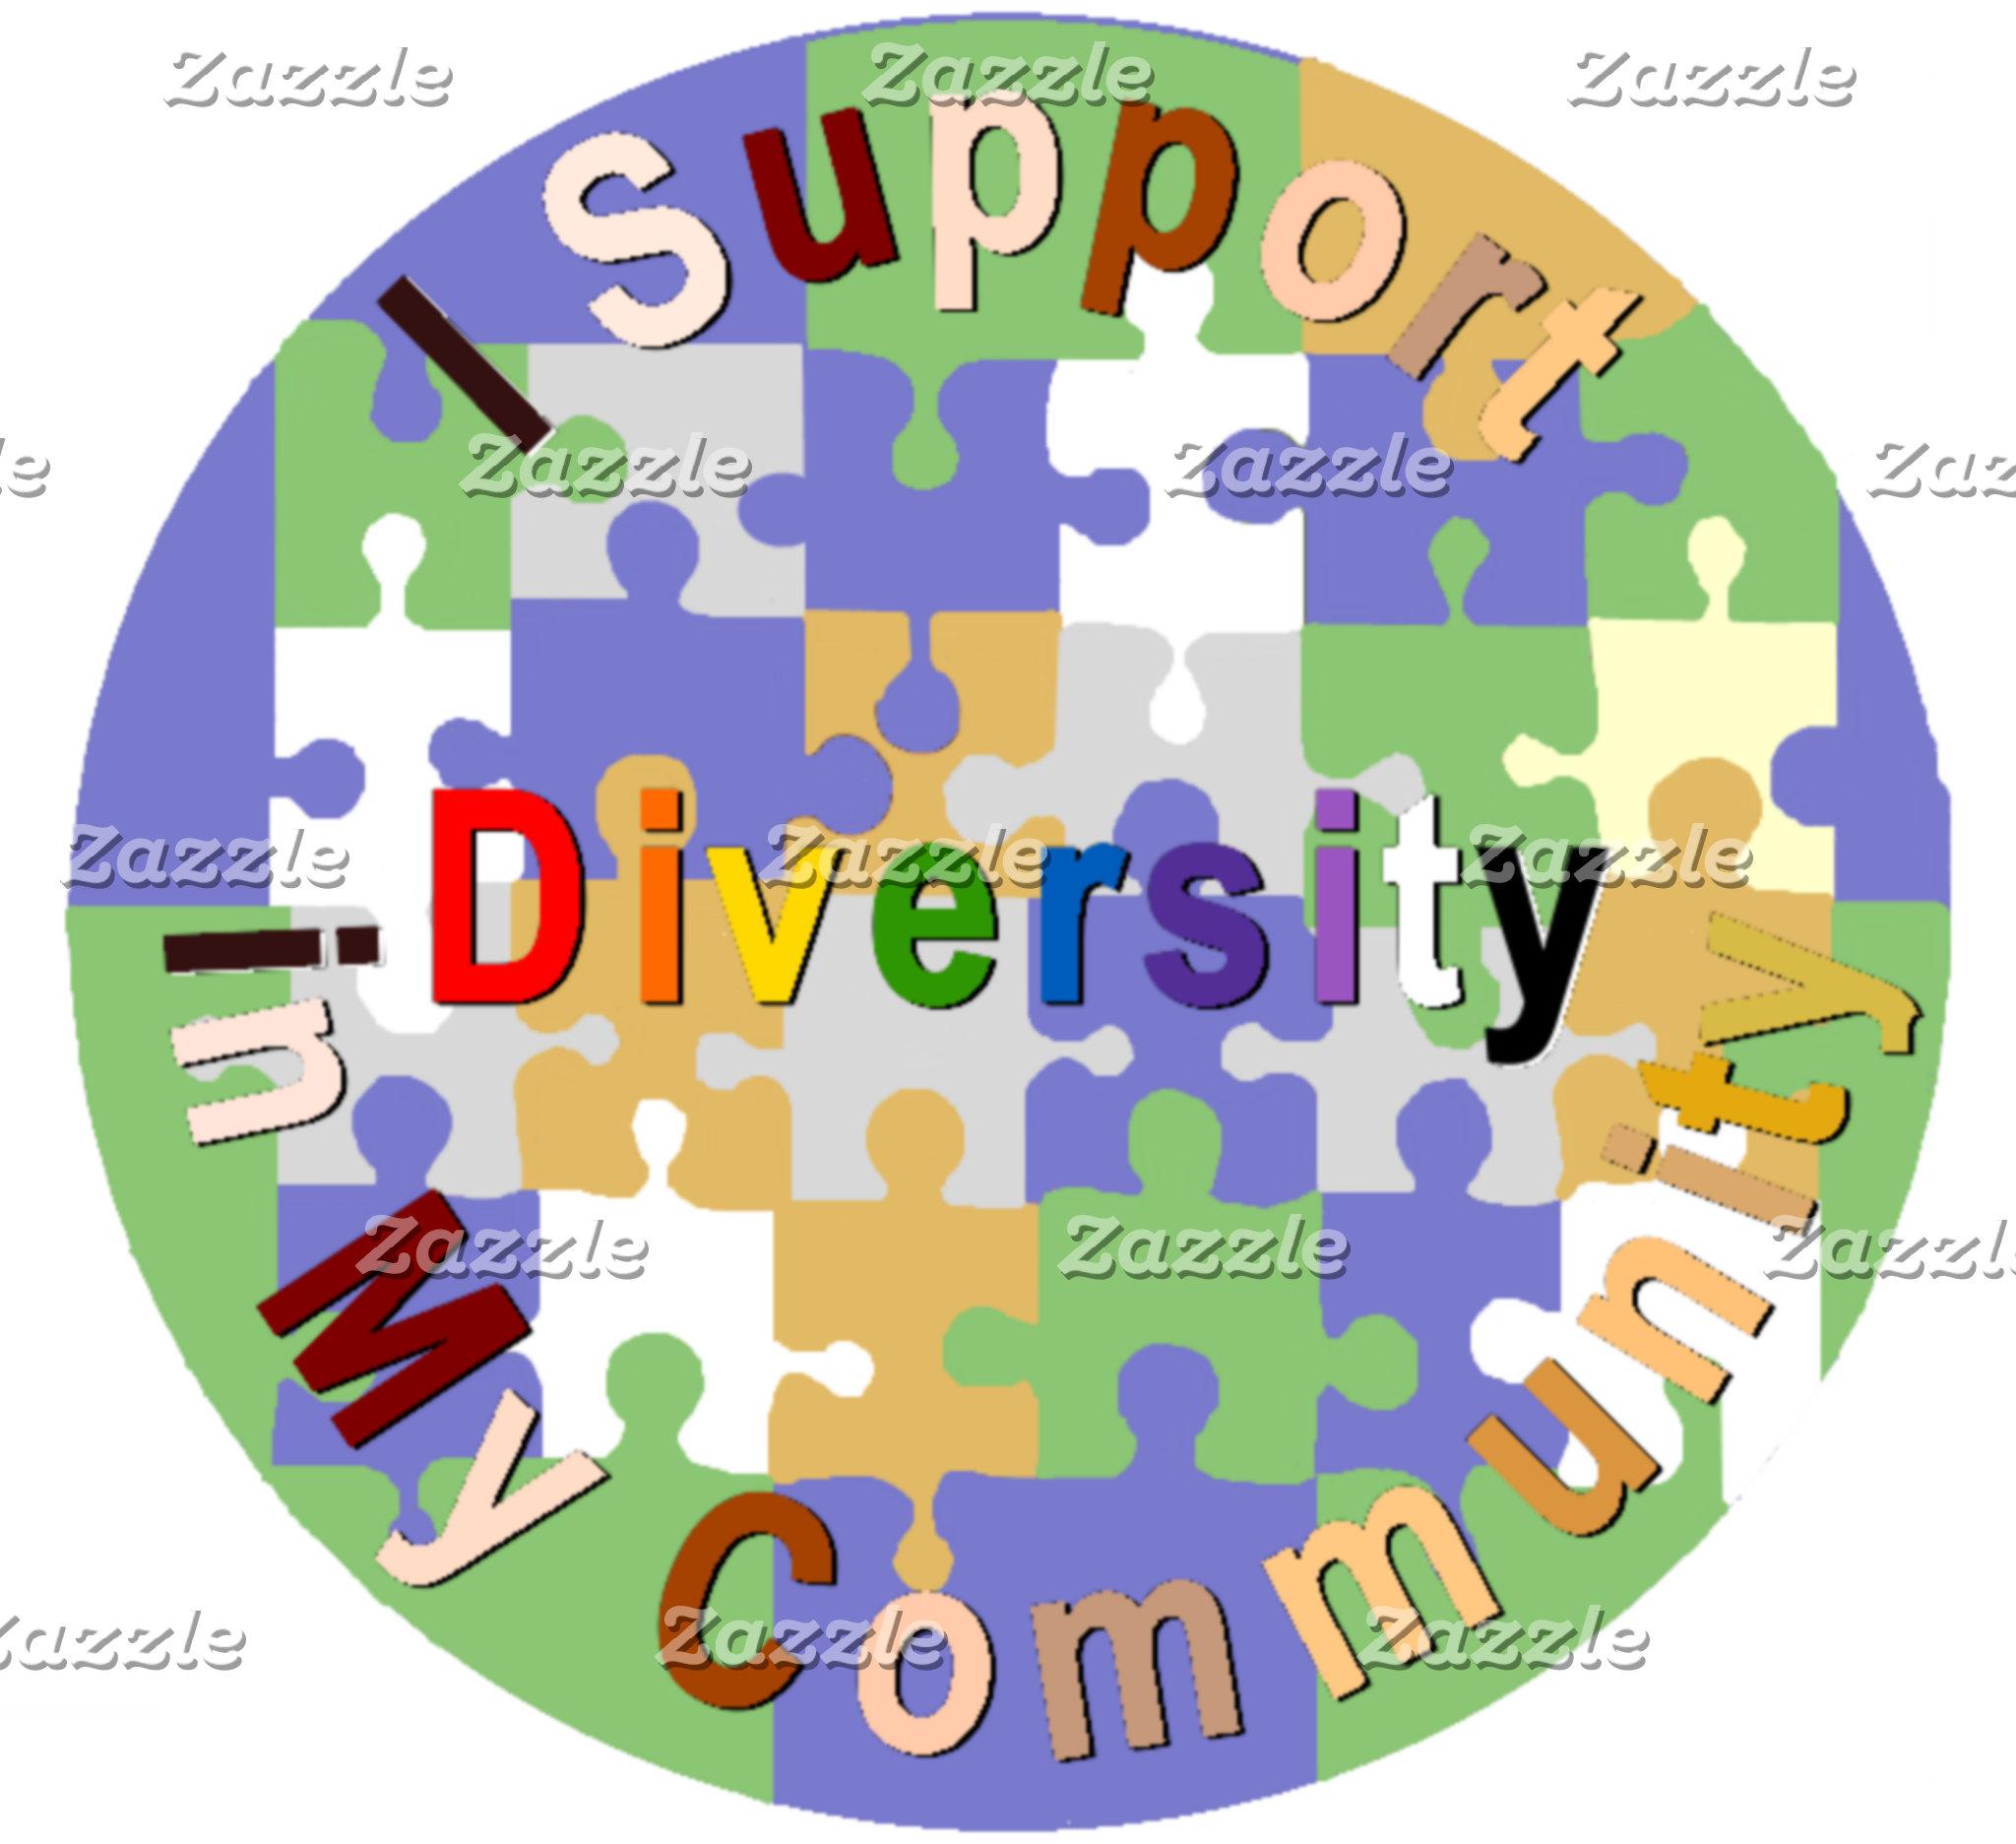 Community / Neighborhood Diversity